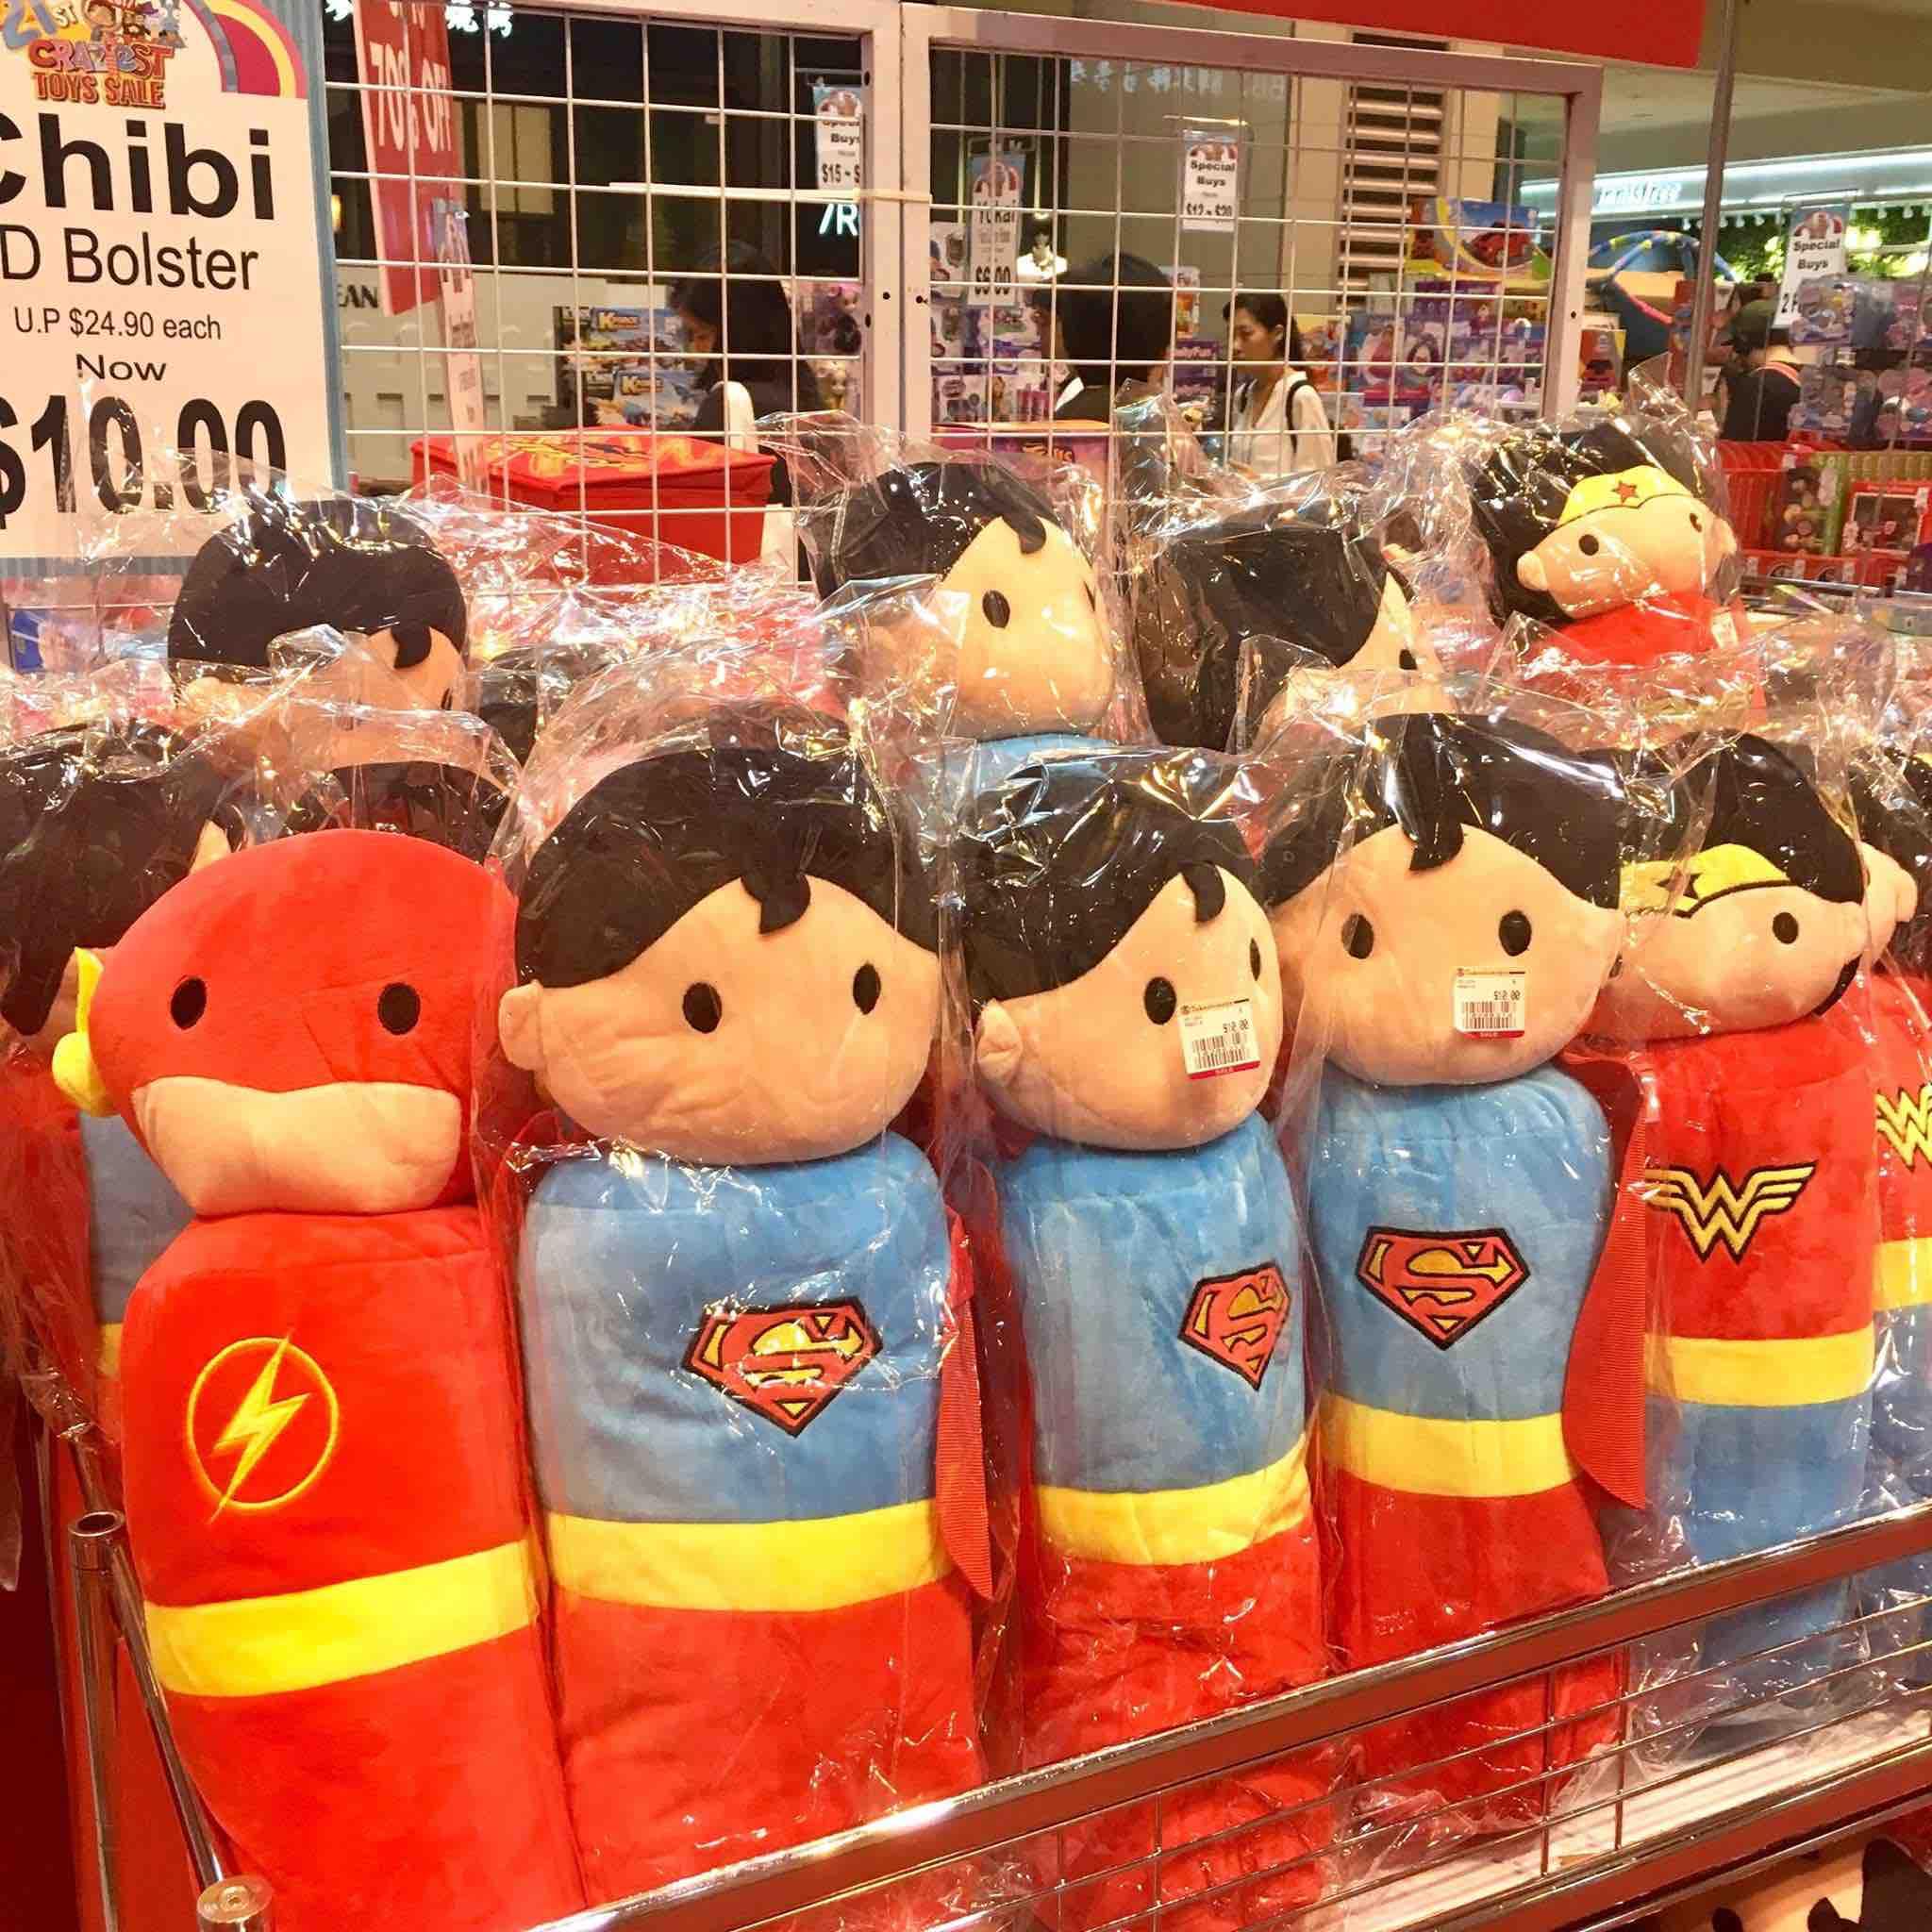 Takashimaya Singapore 21st Craziest Toys Sale Promotion 28 Jul - 6 Aug 2017   Why Not Deals 2 & Promotions